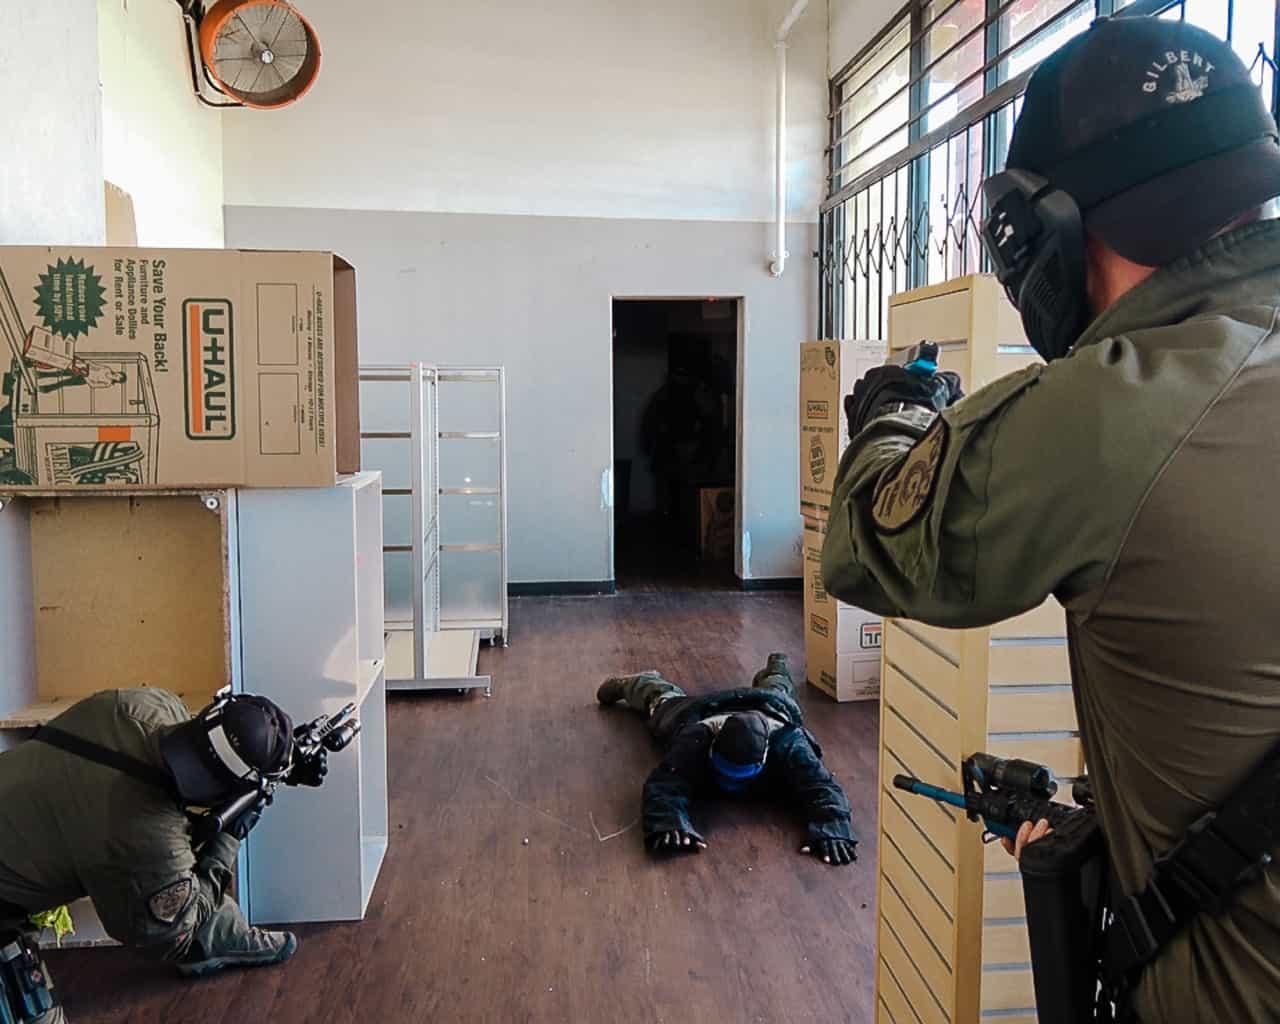 suspect controls with simunition scenarios